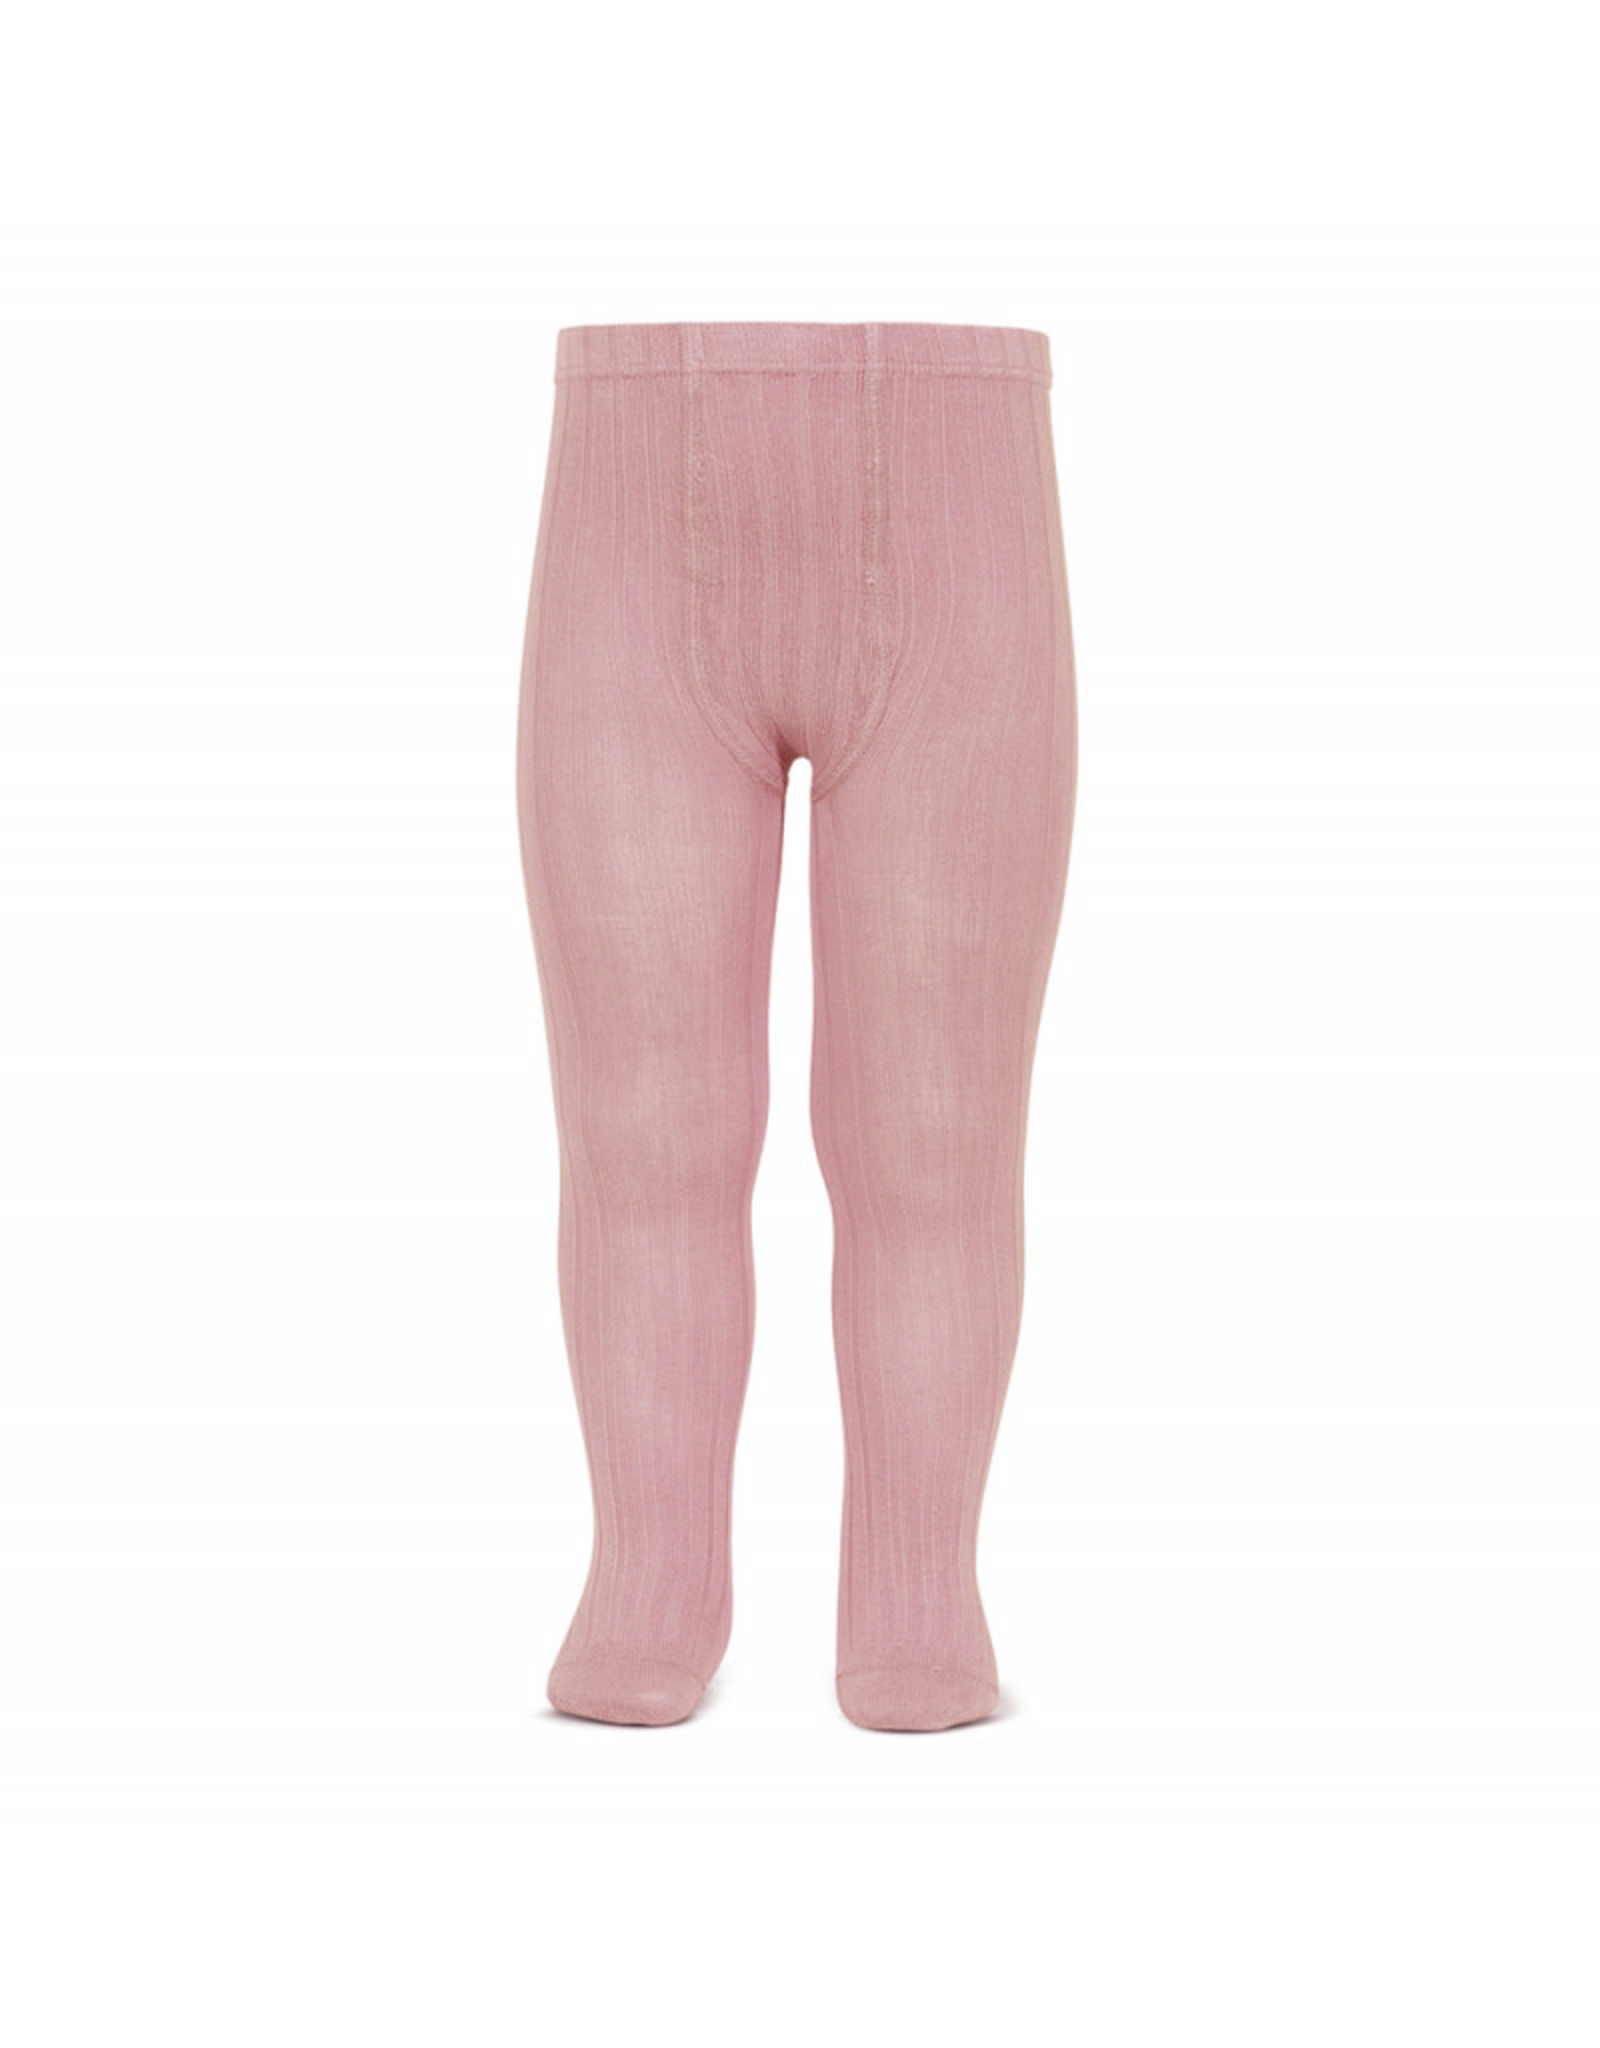 CONDOR Pale Pink Ribbed Tights